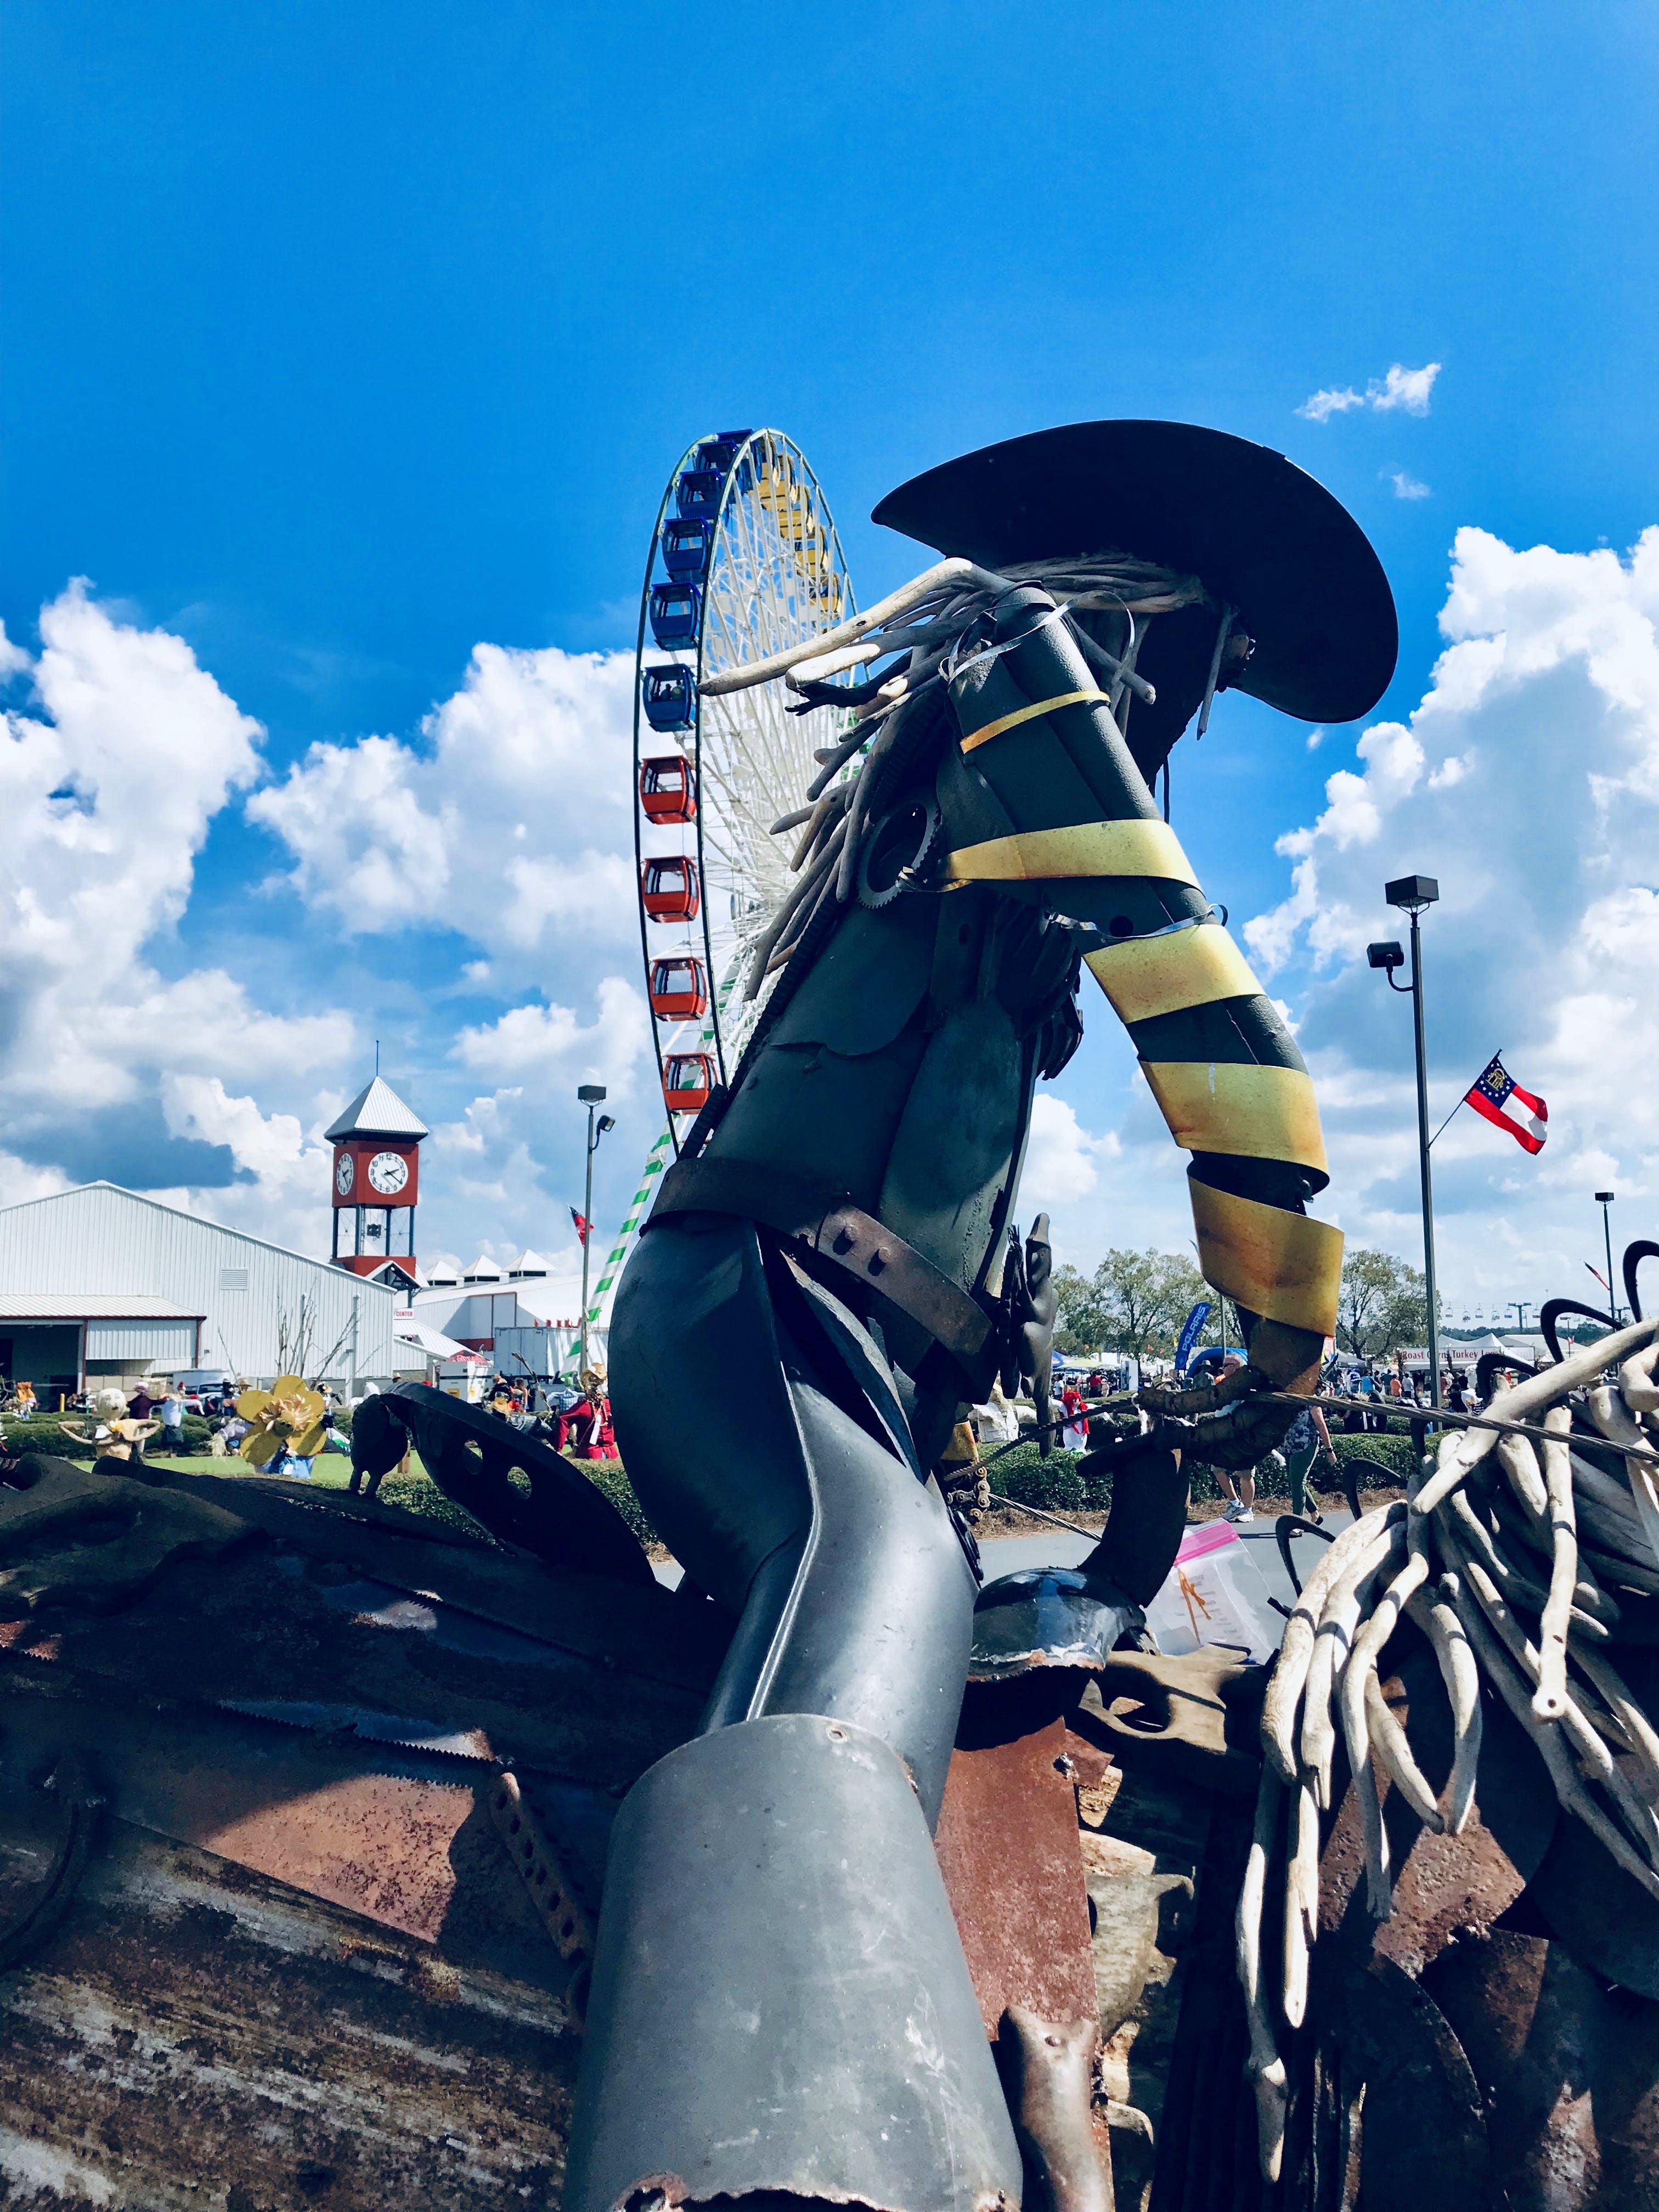 Free stock photo of art, clock tower, cowboy, fair